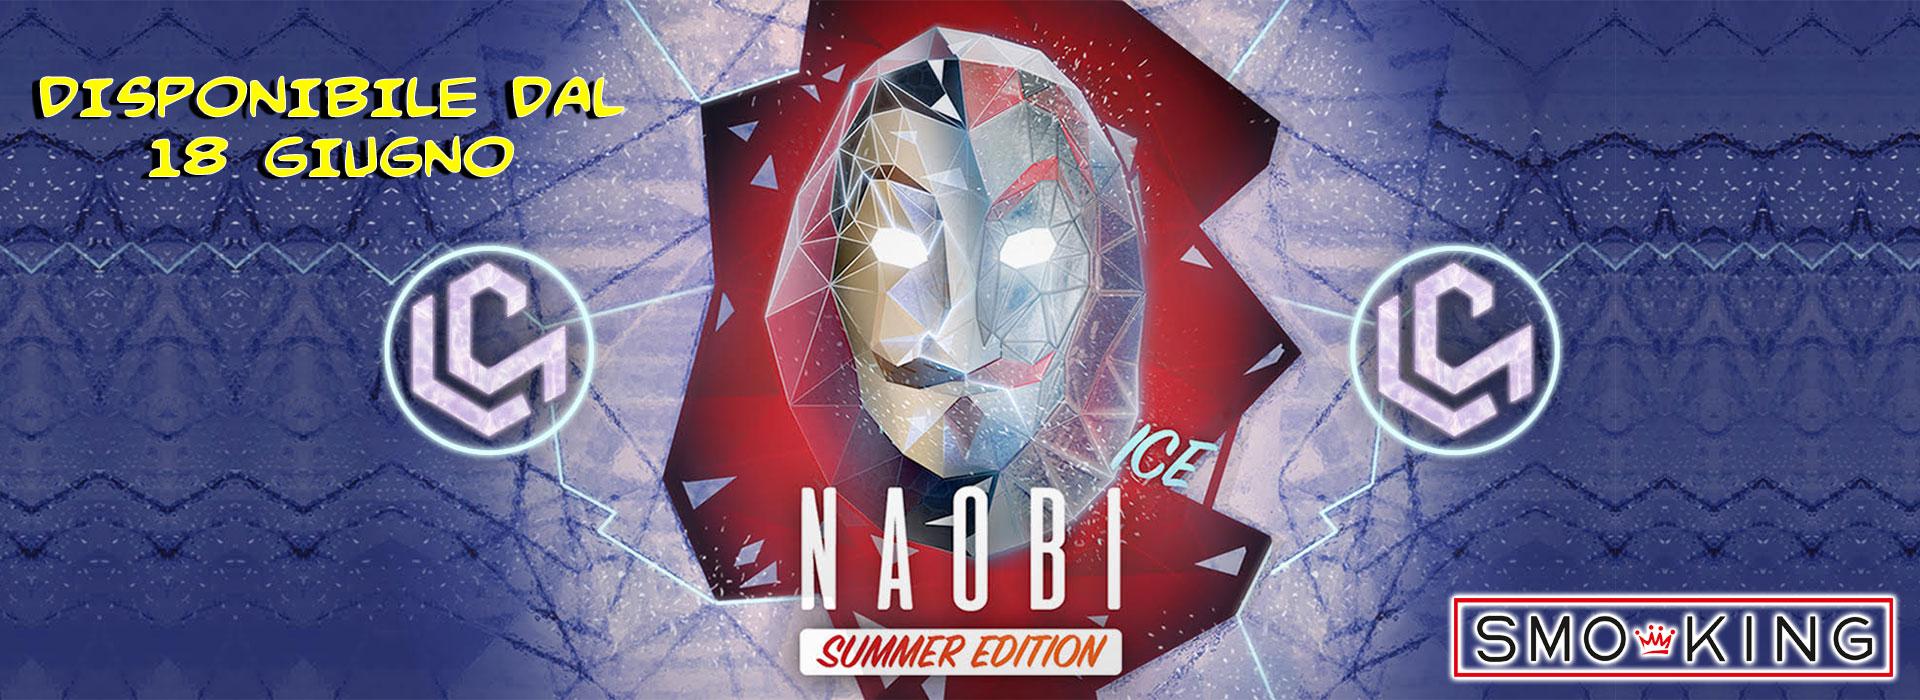 Naobi Ice